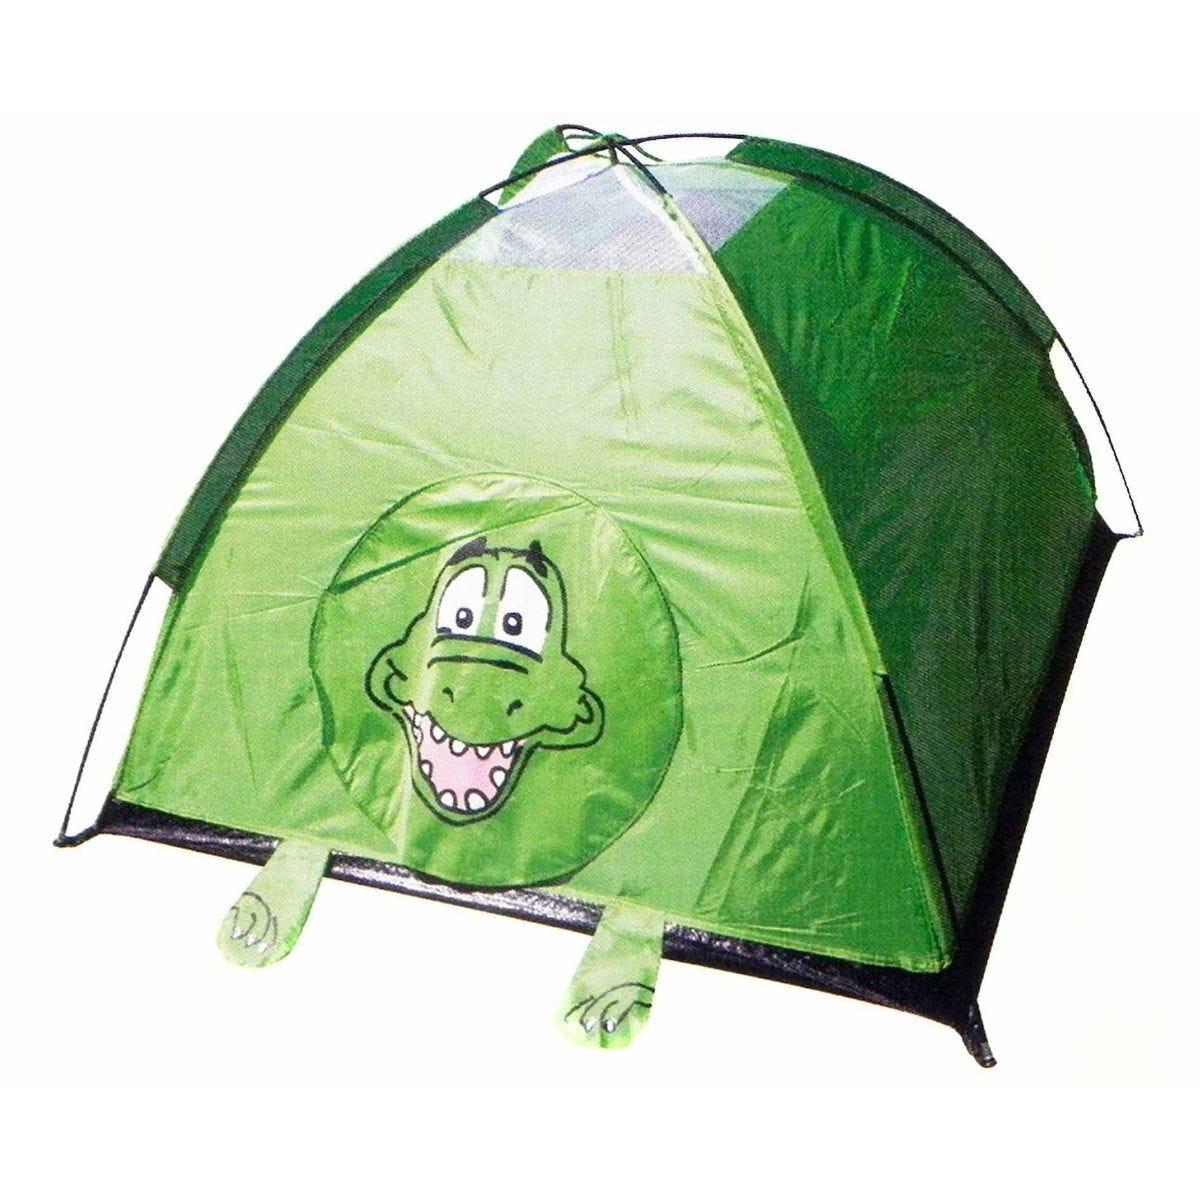 Jungle Animal Camping Play Tent Crocodile